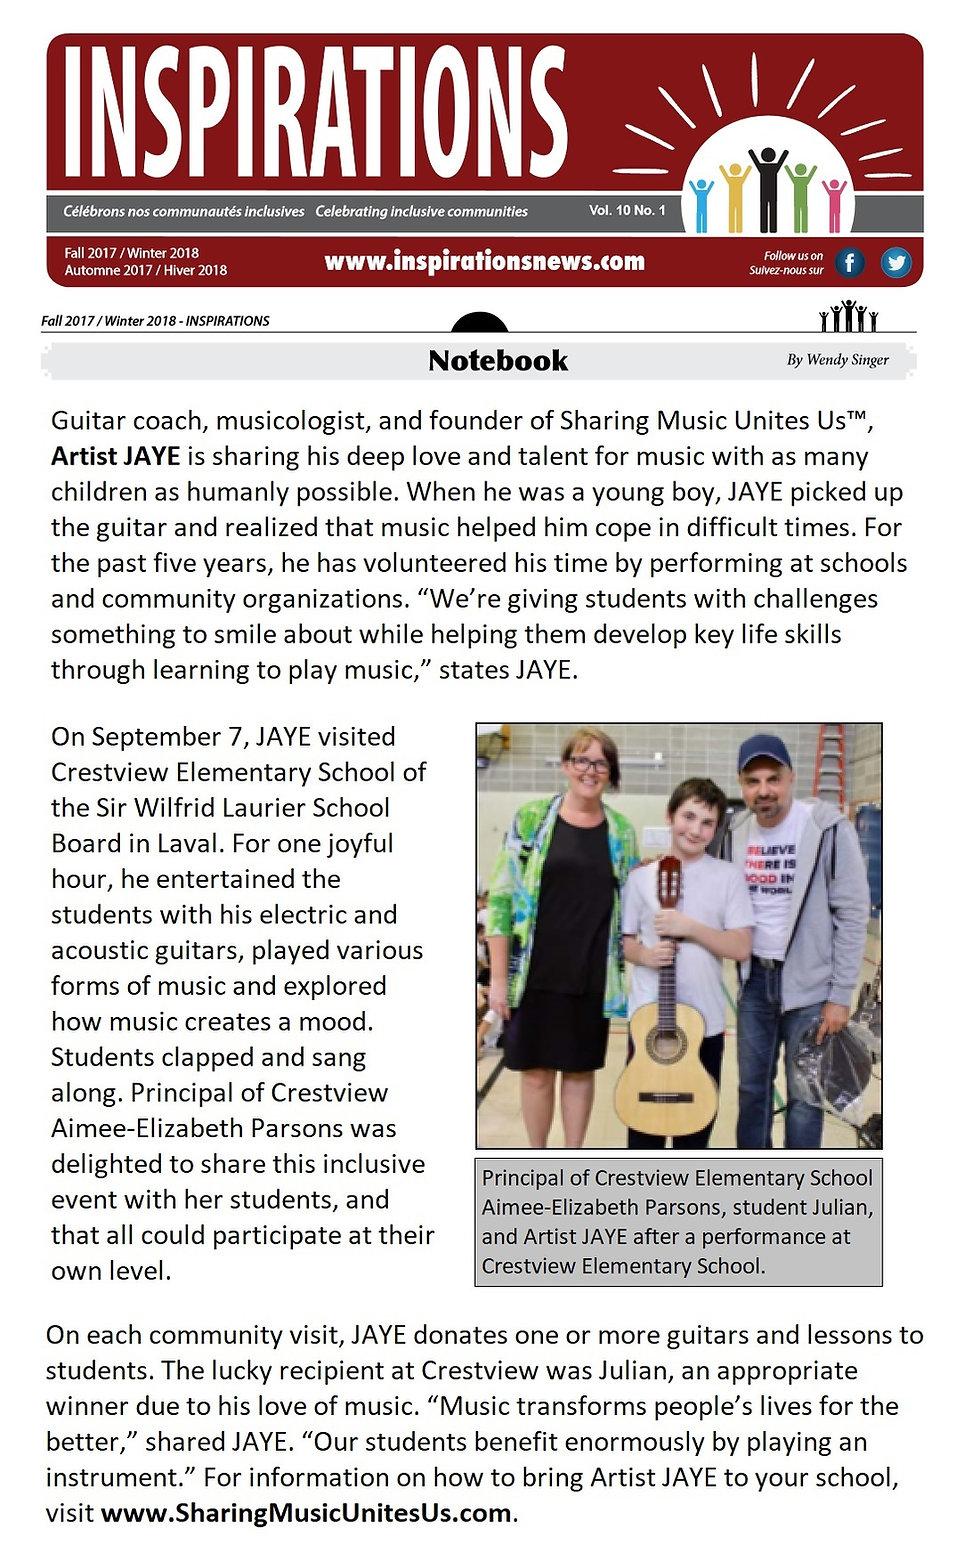 Inspirations Magazine, SWLSB, Sir Wilfrid Laurier School Board, Guitar Teacher, Artist JAYE's Sharing Music Unites Us™ cause